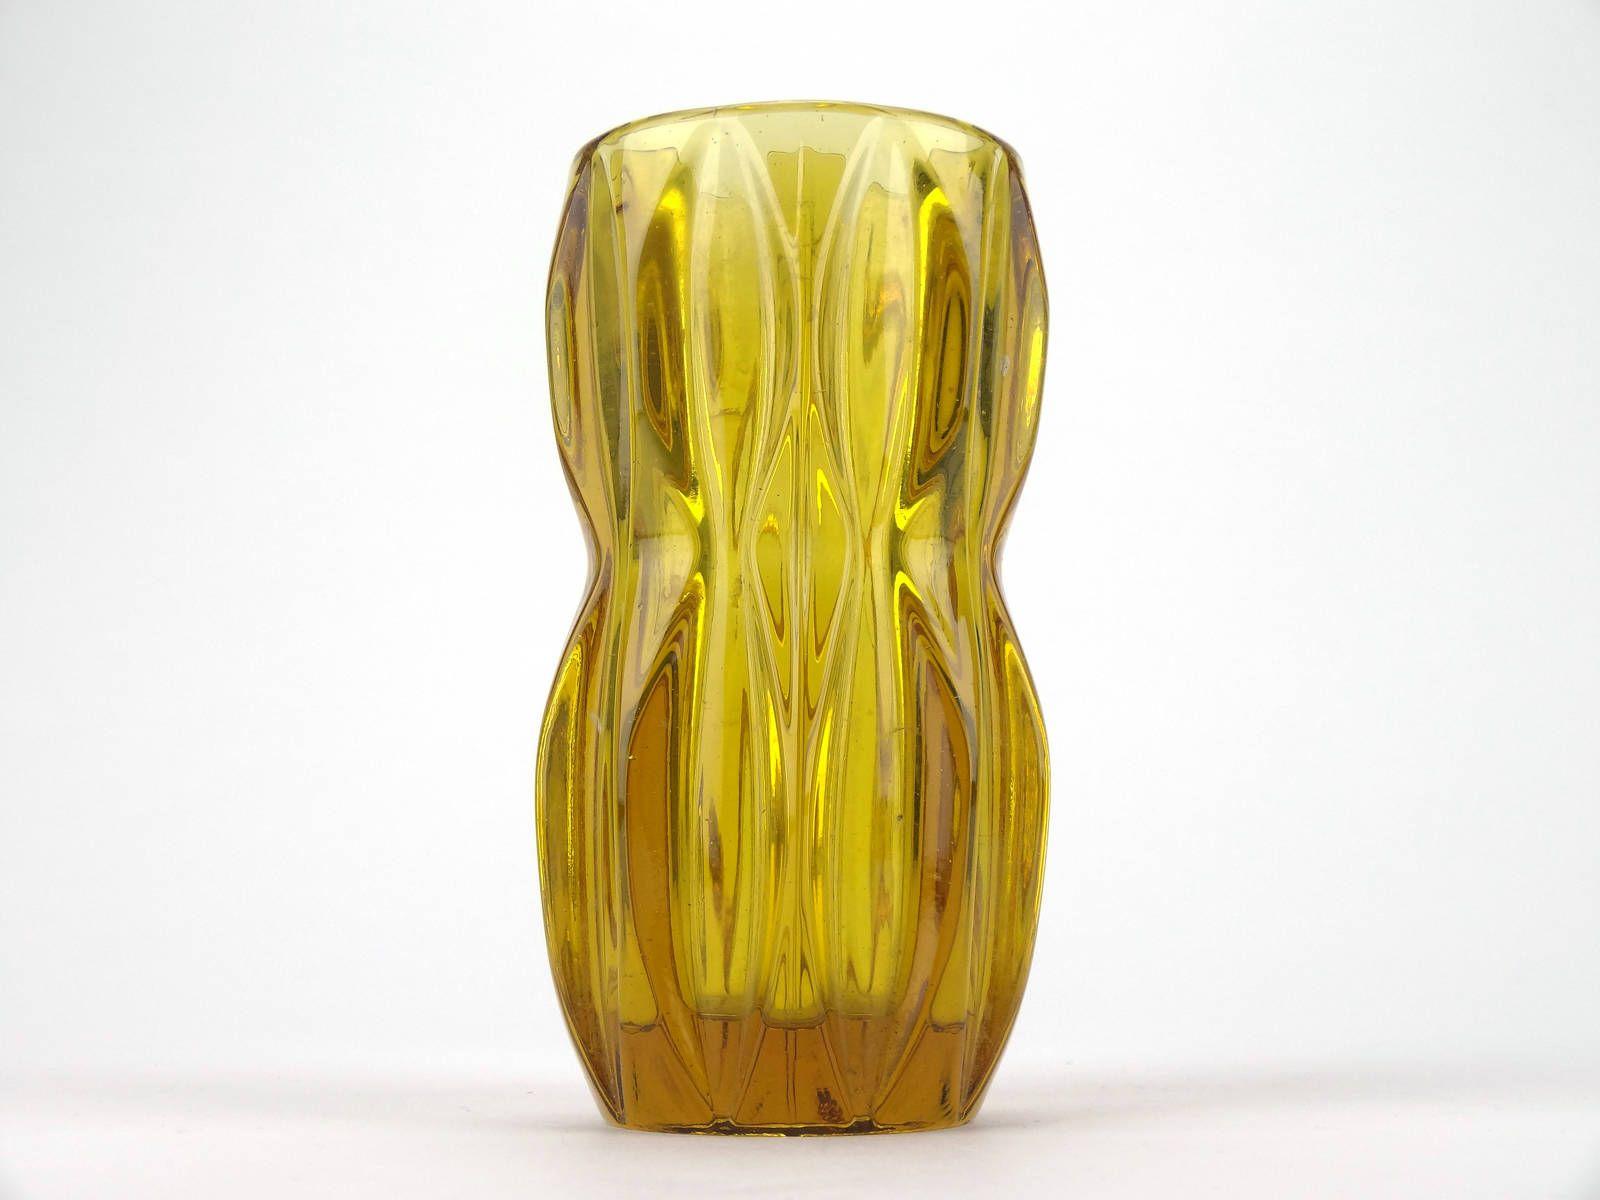 Vintage Czech Retro Yellow Amber Glass Vase By Jan Schmid For Glass Flower Vases Bohemia Glass Amber Glass